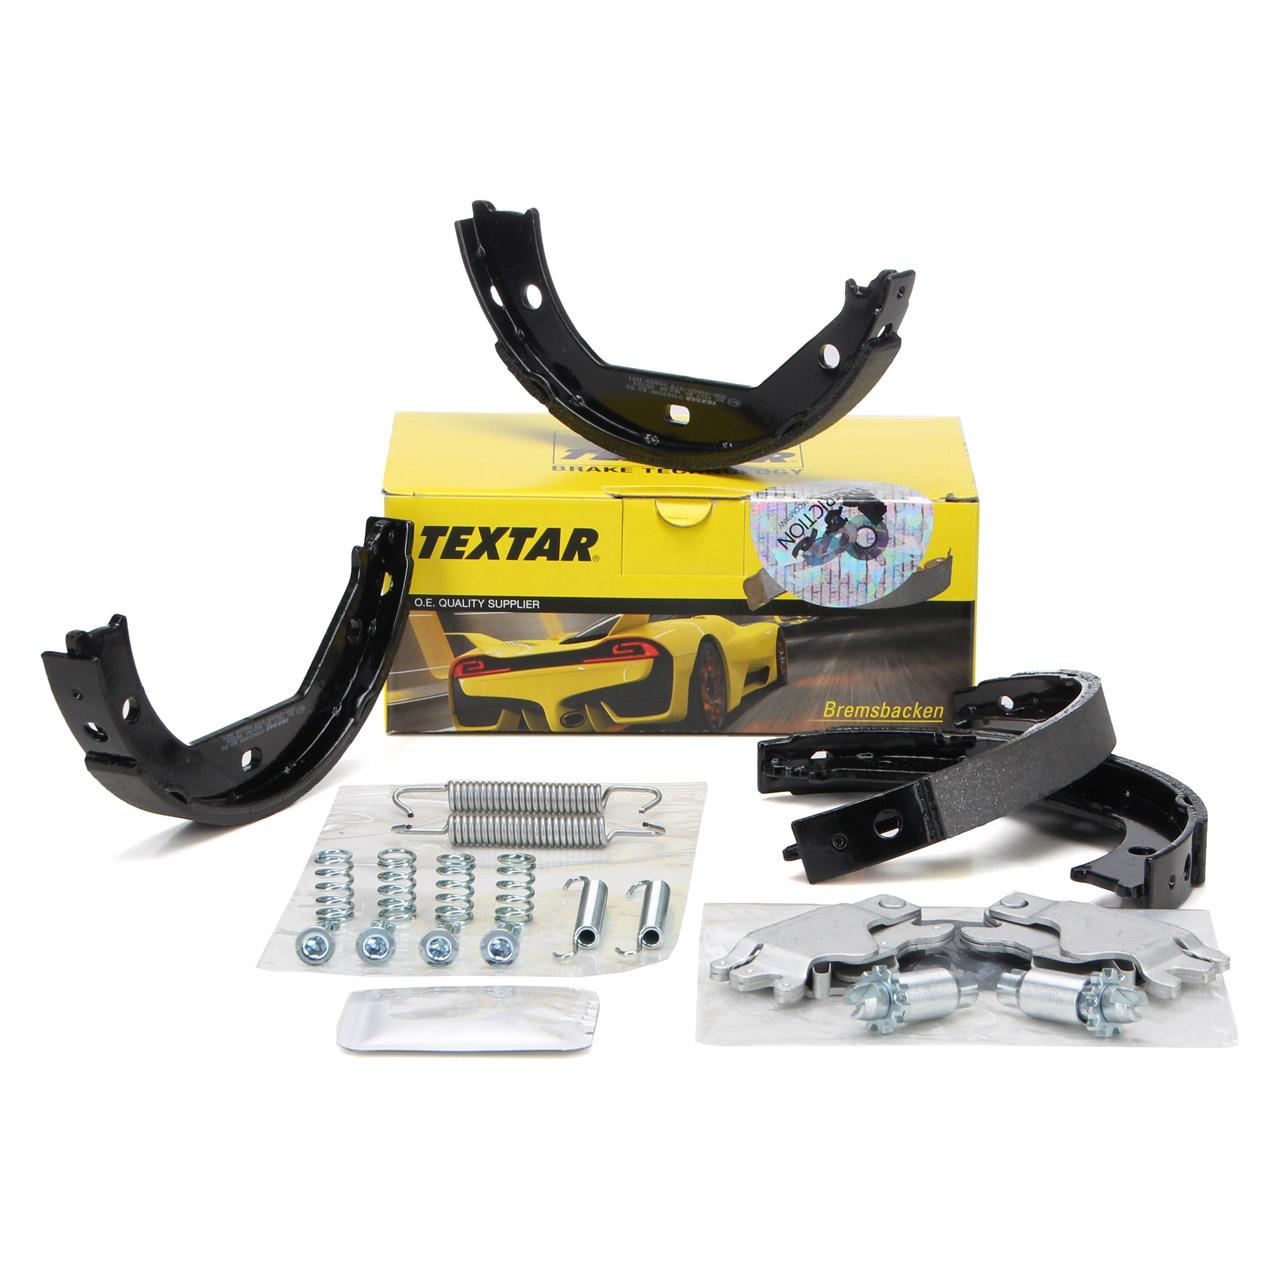 TEXTAR 91049300 Bremsbacken + Federn + Nachsteller Satz BMW E81-88 E46 E90-93 F30-34 F32